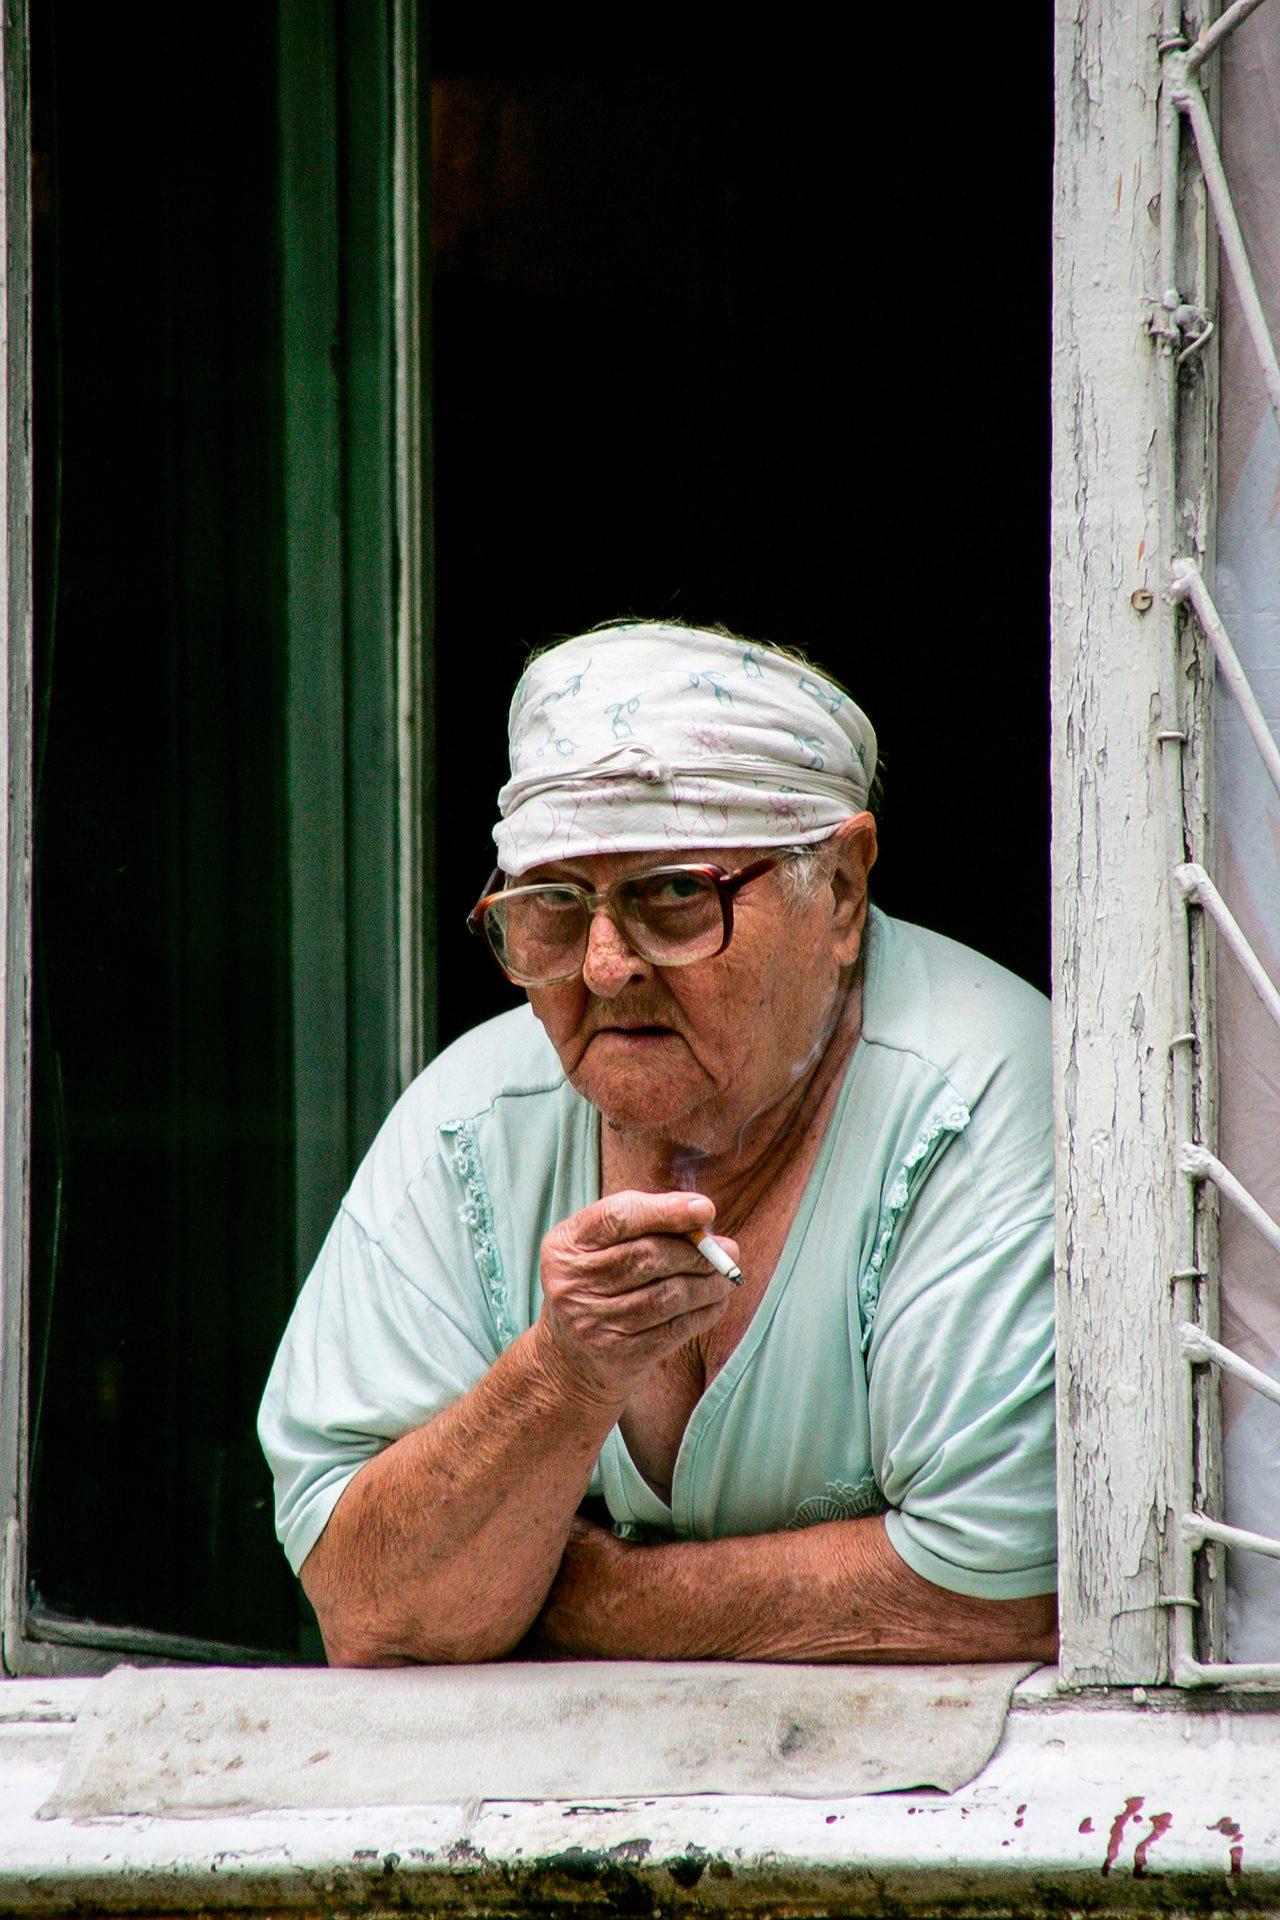 Babushka, granny, smoker, window, eldery, Almaty, Kazakhstan, soviet